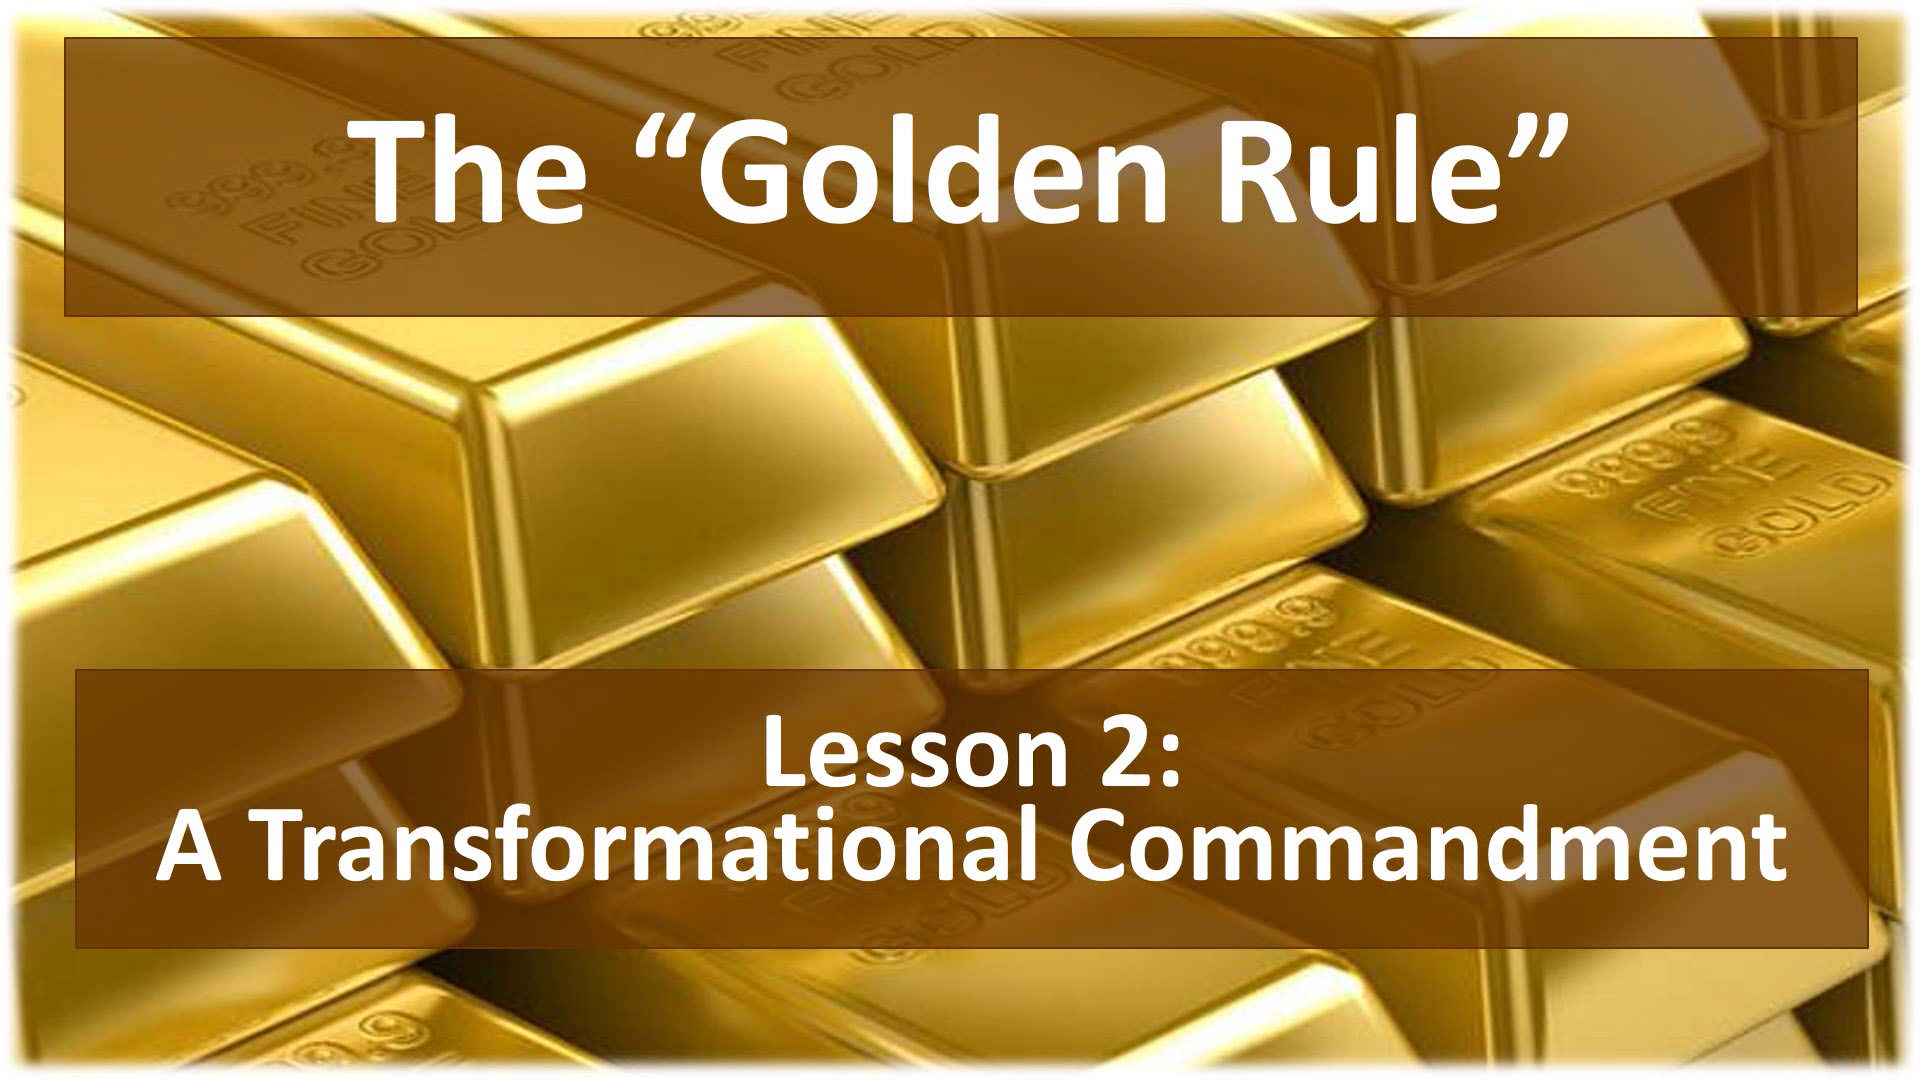 The Golden Rule (Lesson 2: A Transformational Commandment)